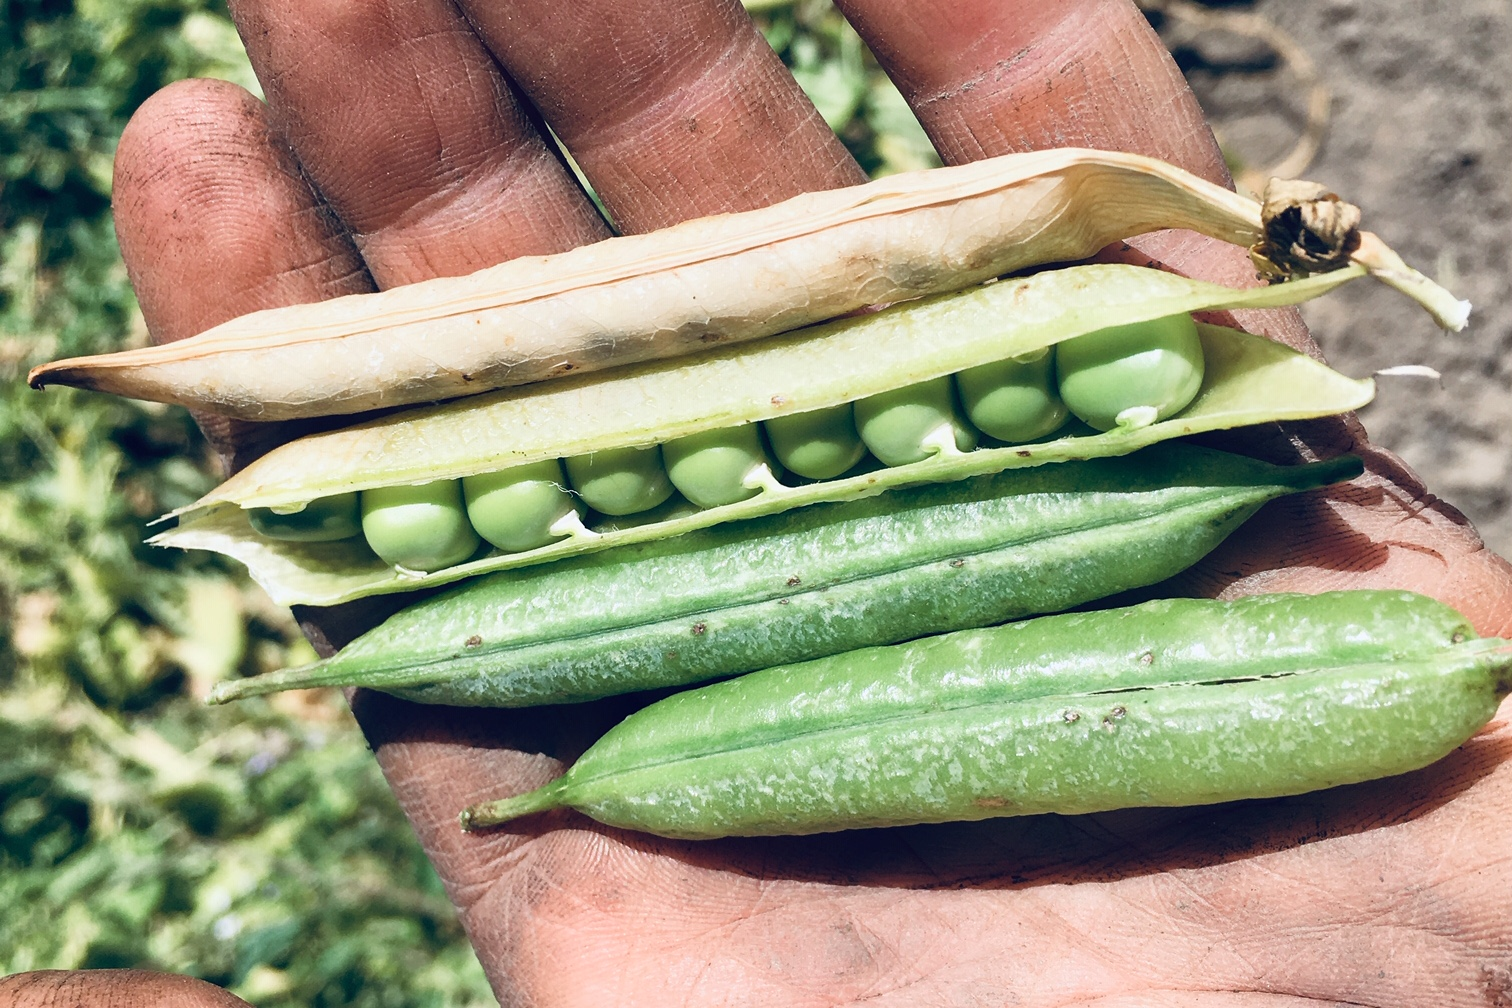 Mature English Shelling Peas